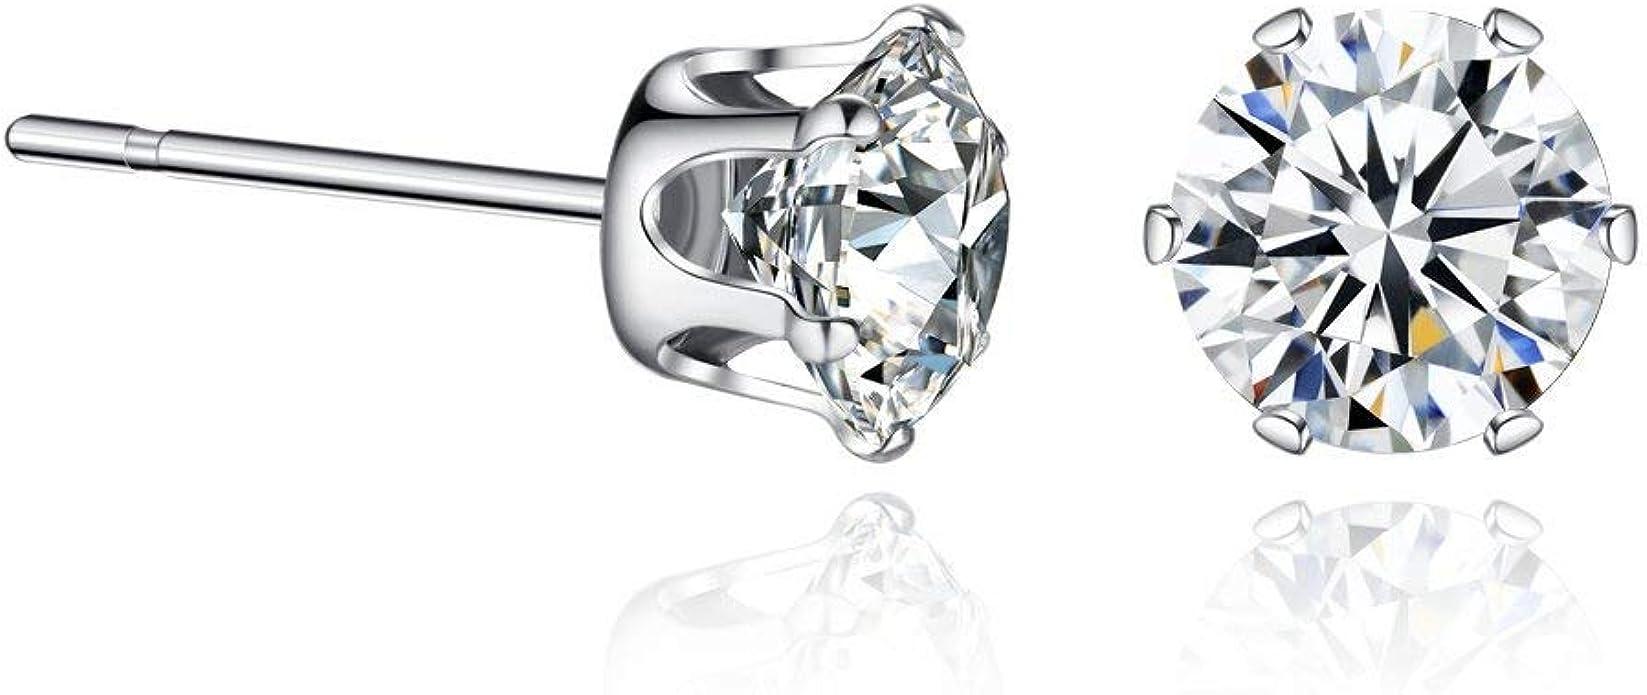 Silver Earrrings high quality  Cubic Zirconia  American Diamond